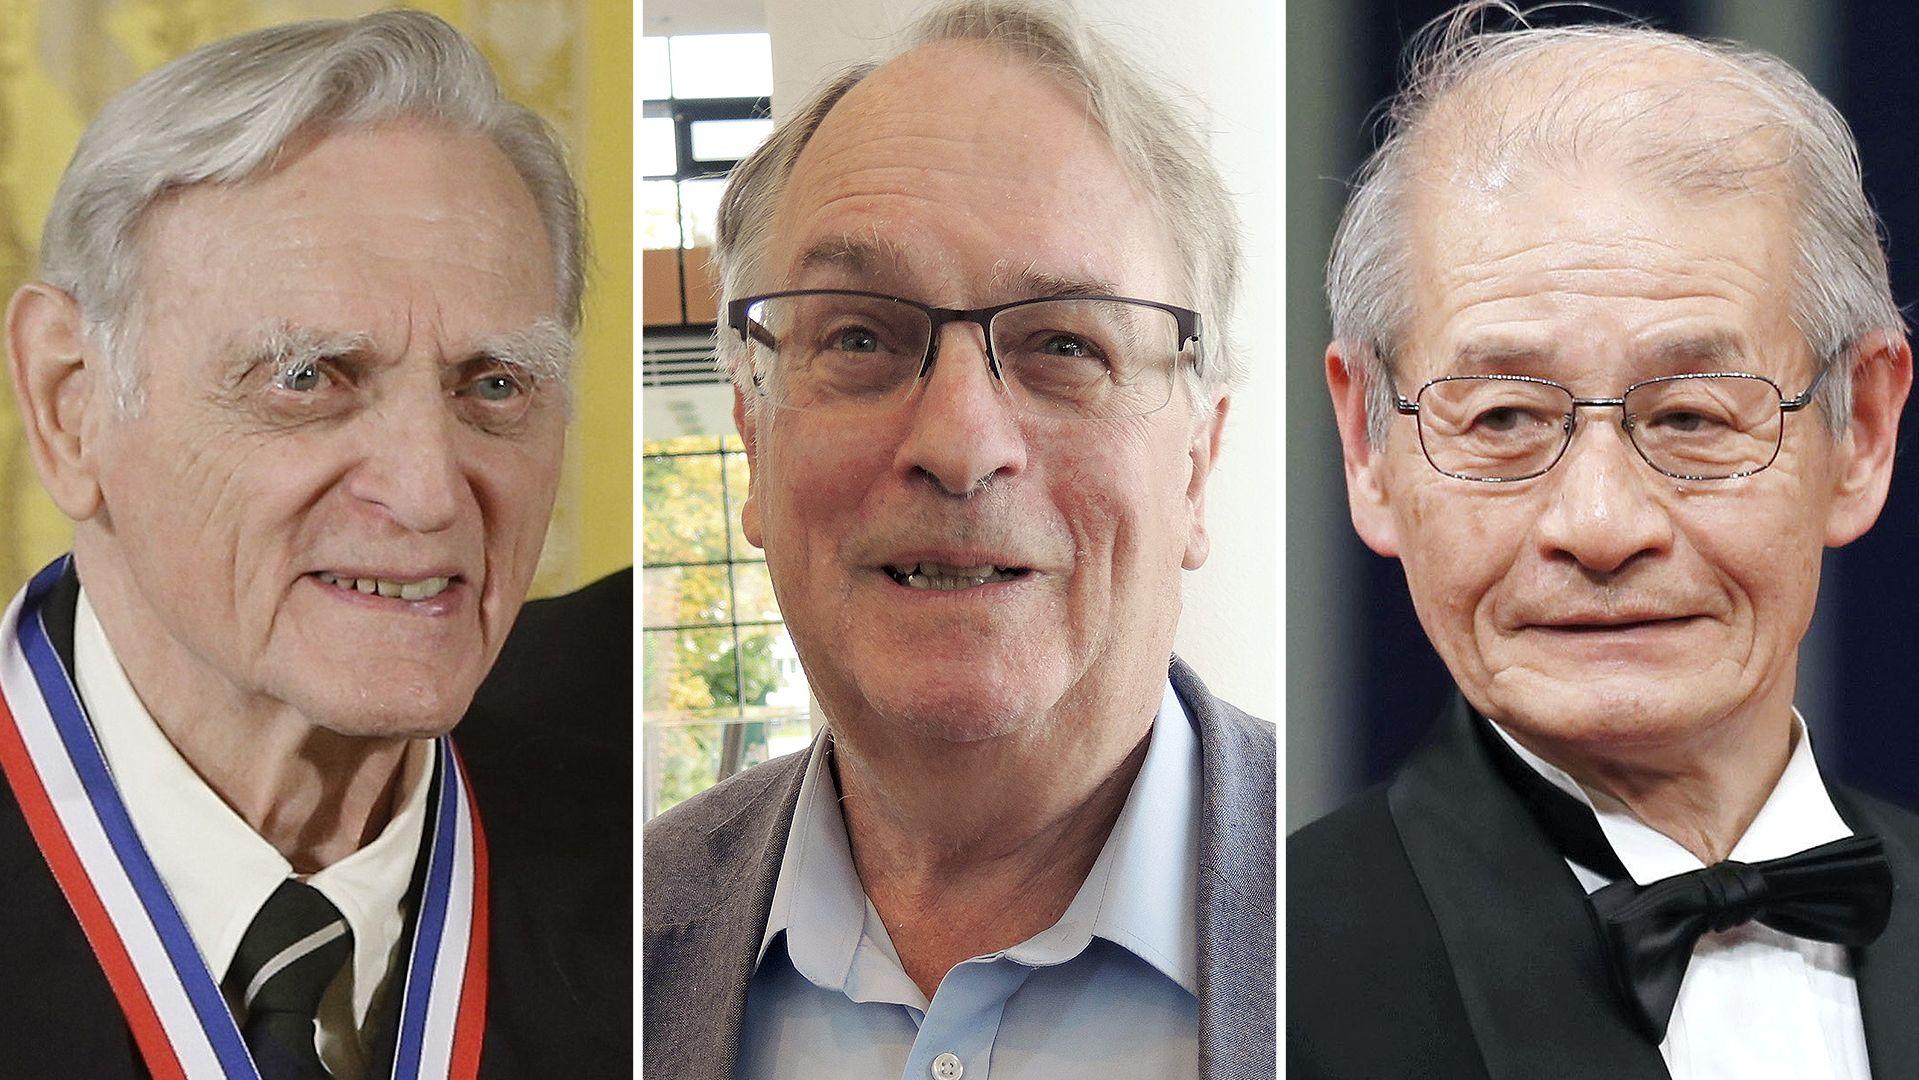 Chemie-Nobelpreisträger 2019: John Goodenough, Stanley Whittingham und Akira Yoshino